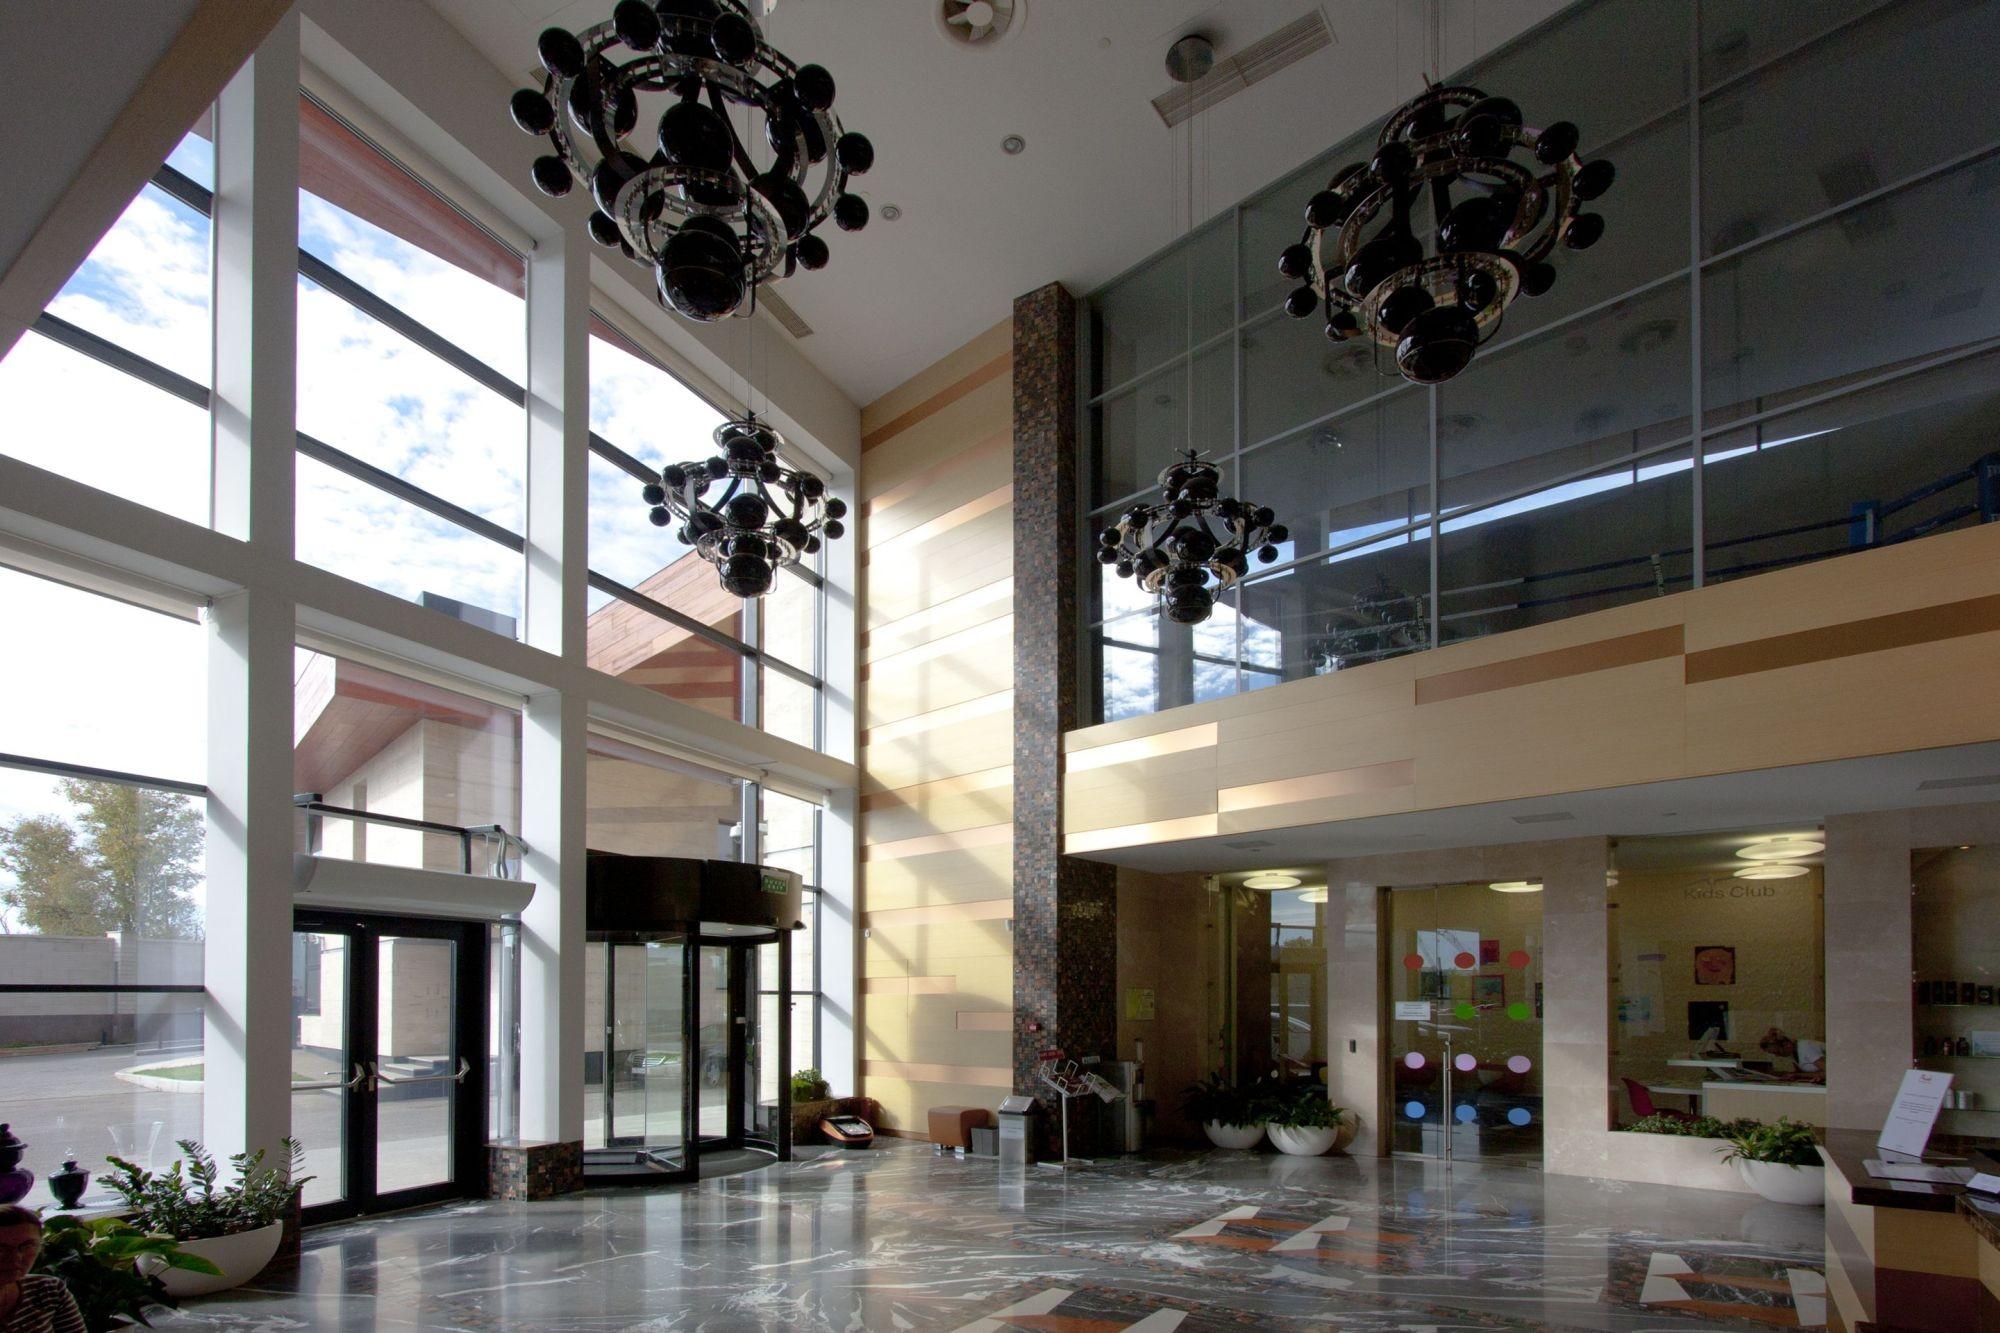 Zukovka-21 / Asadov Architectural Studio